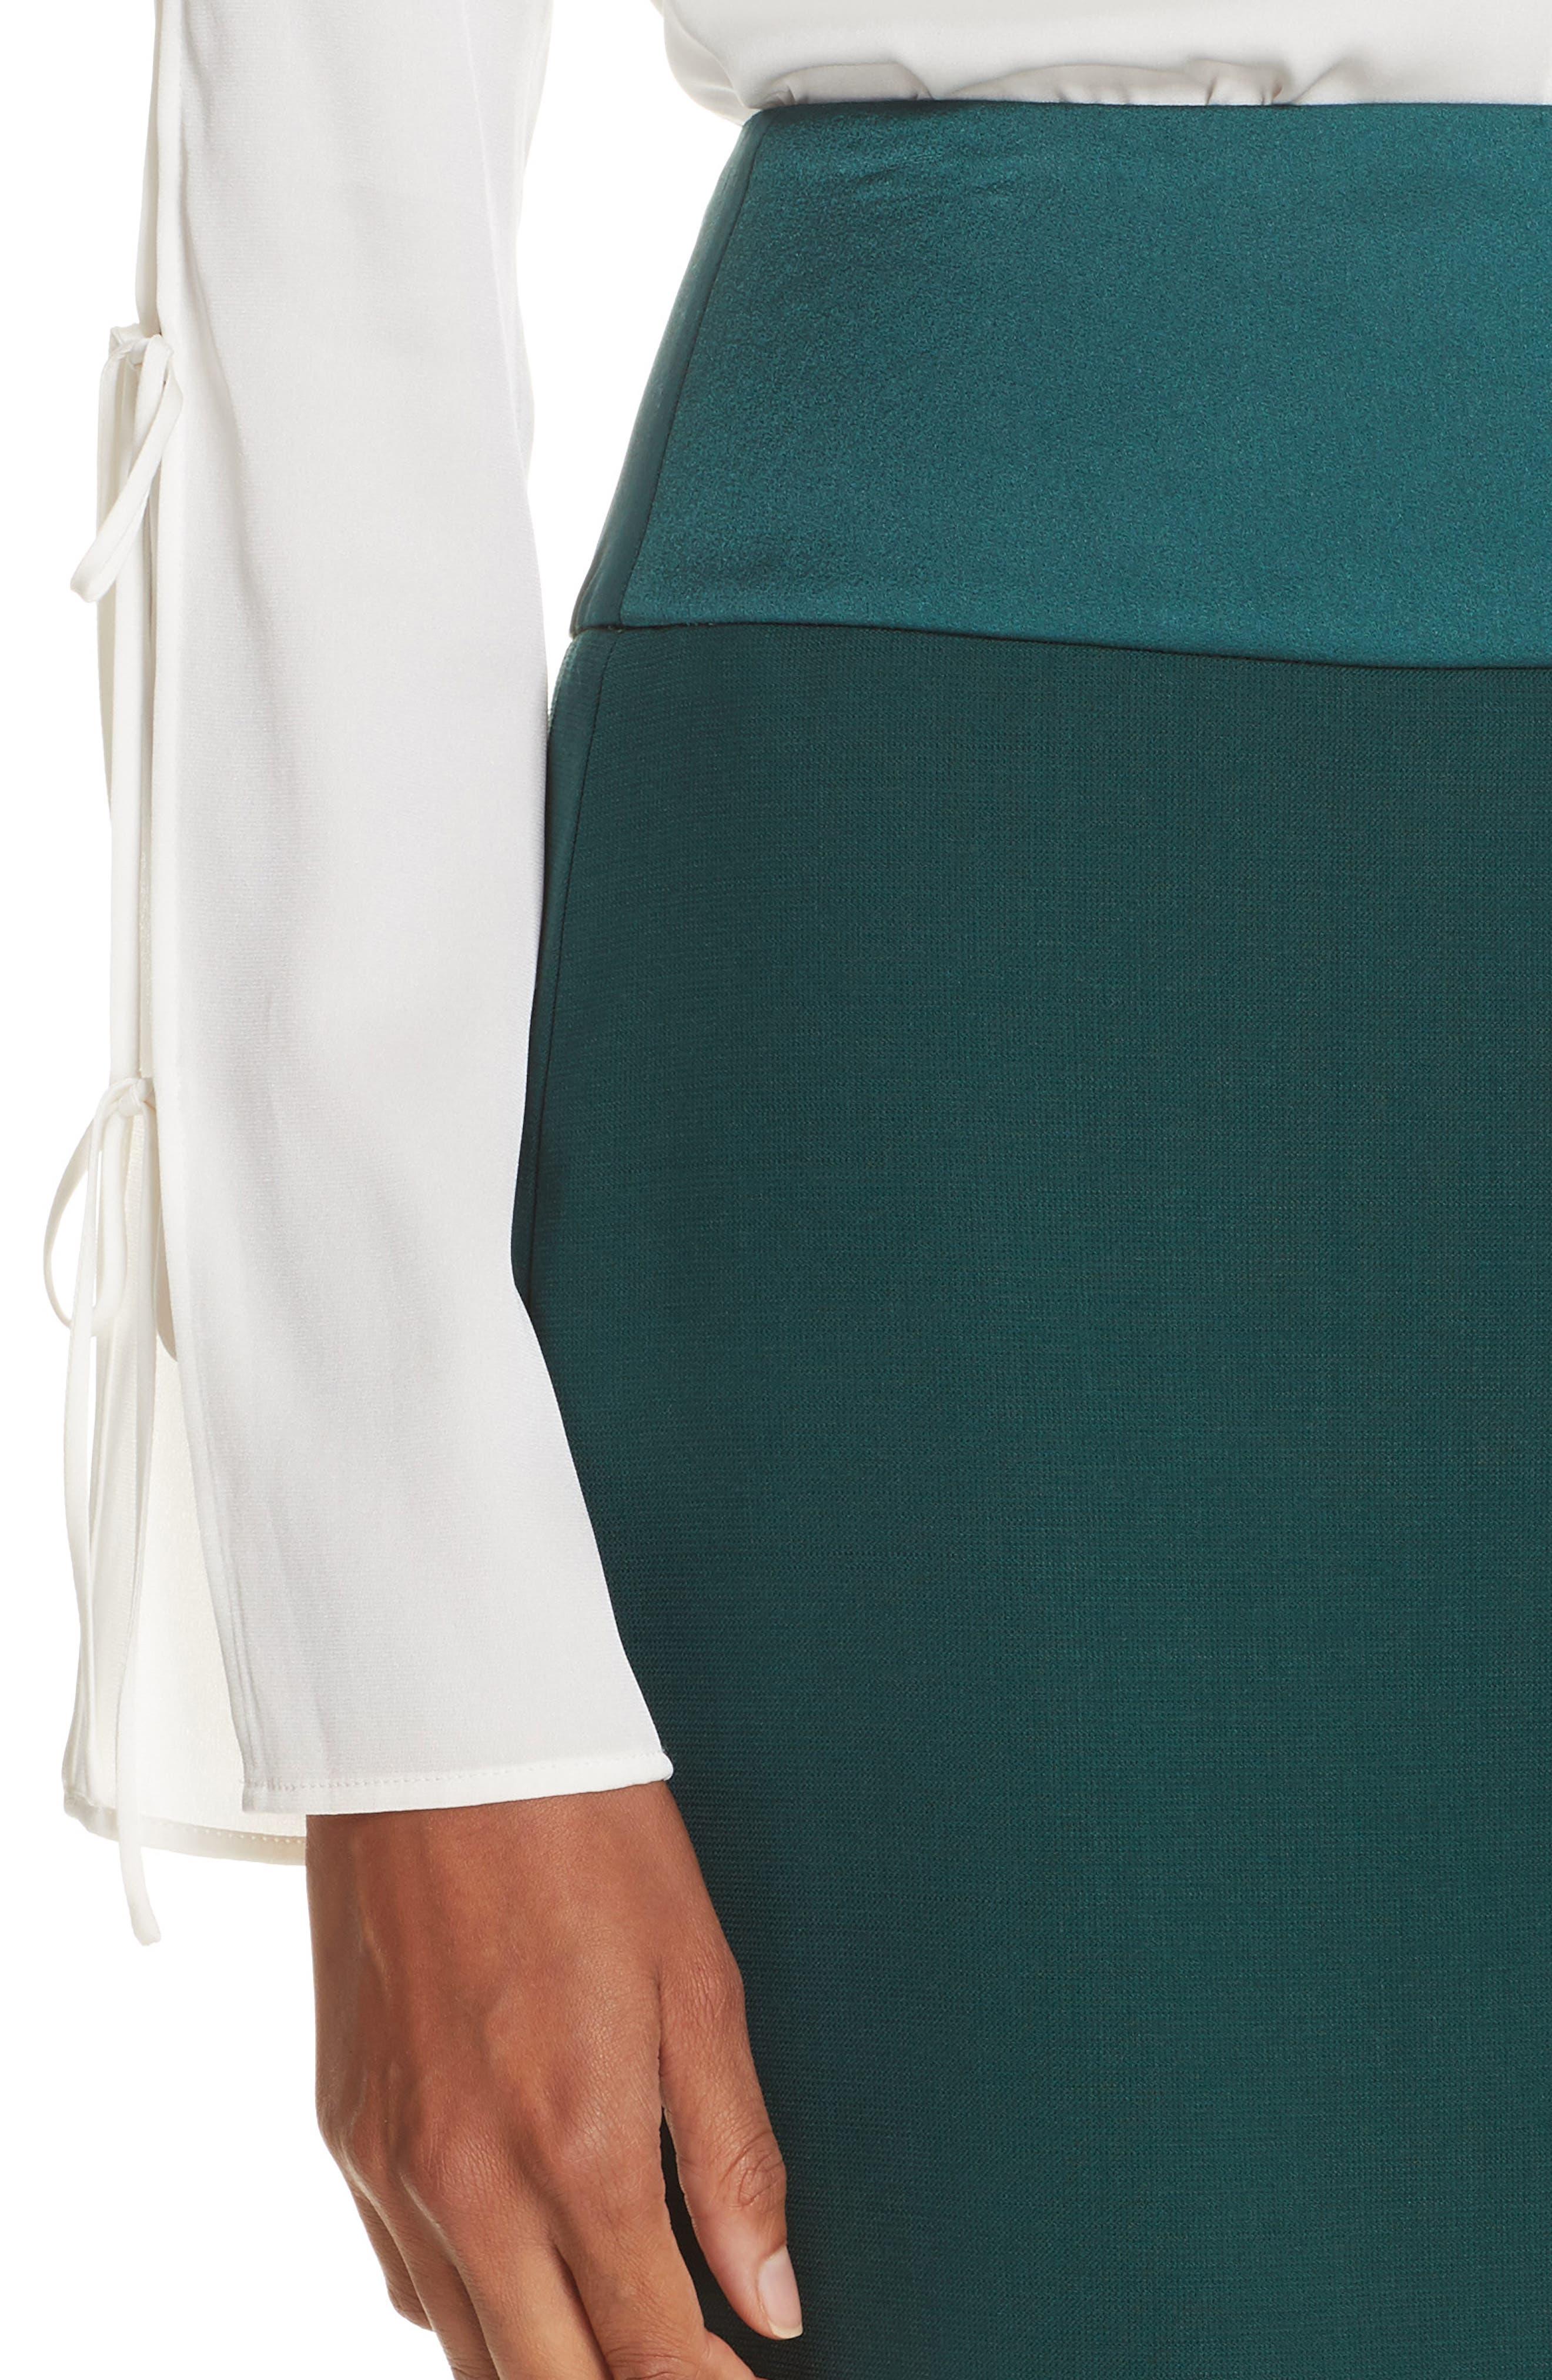 Vanufa Stretch Wool Suit Skirt,                             Alternate thumbnail 4, color,                             PINE GREEN